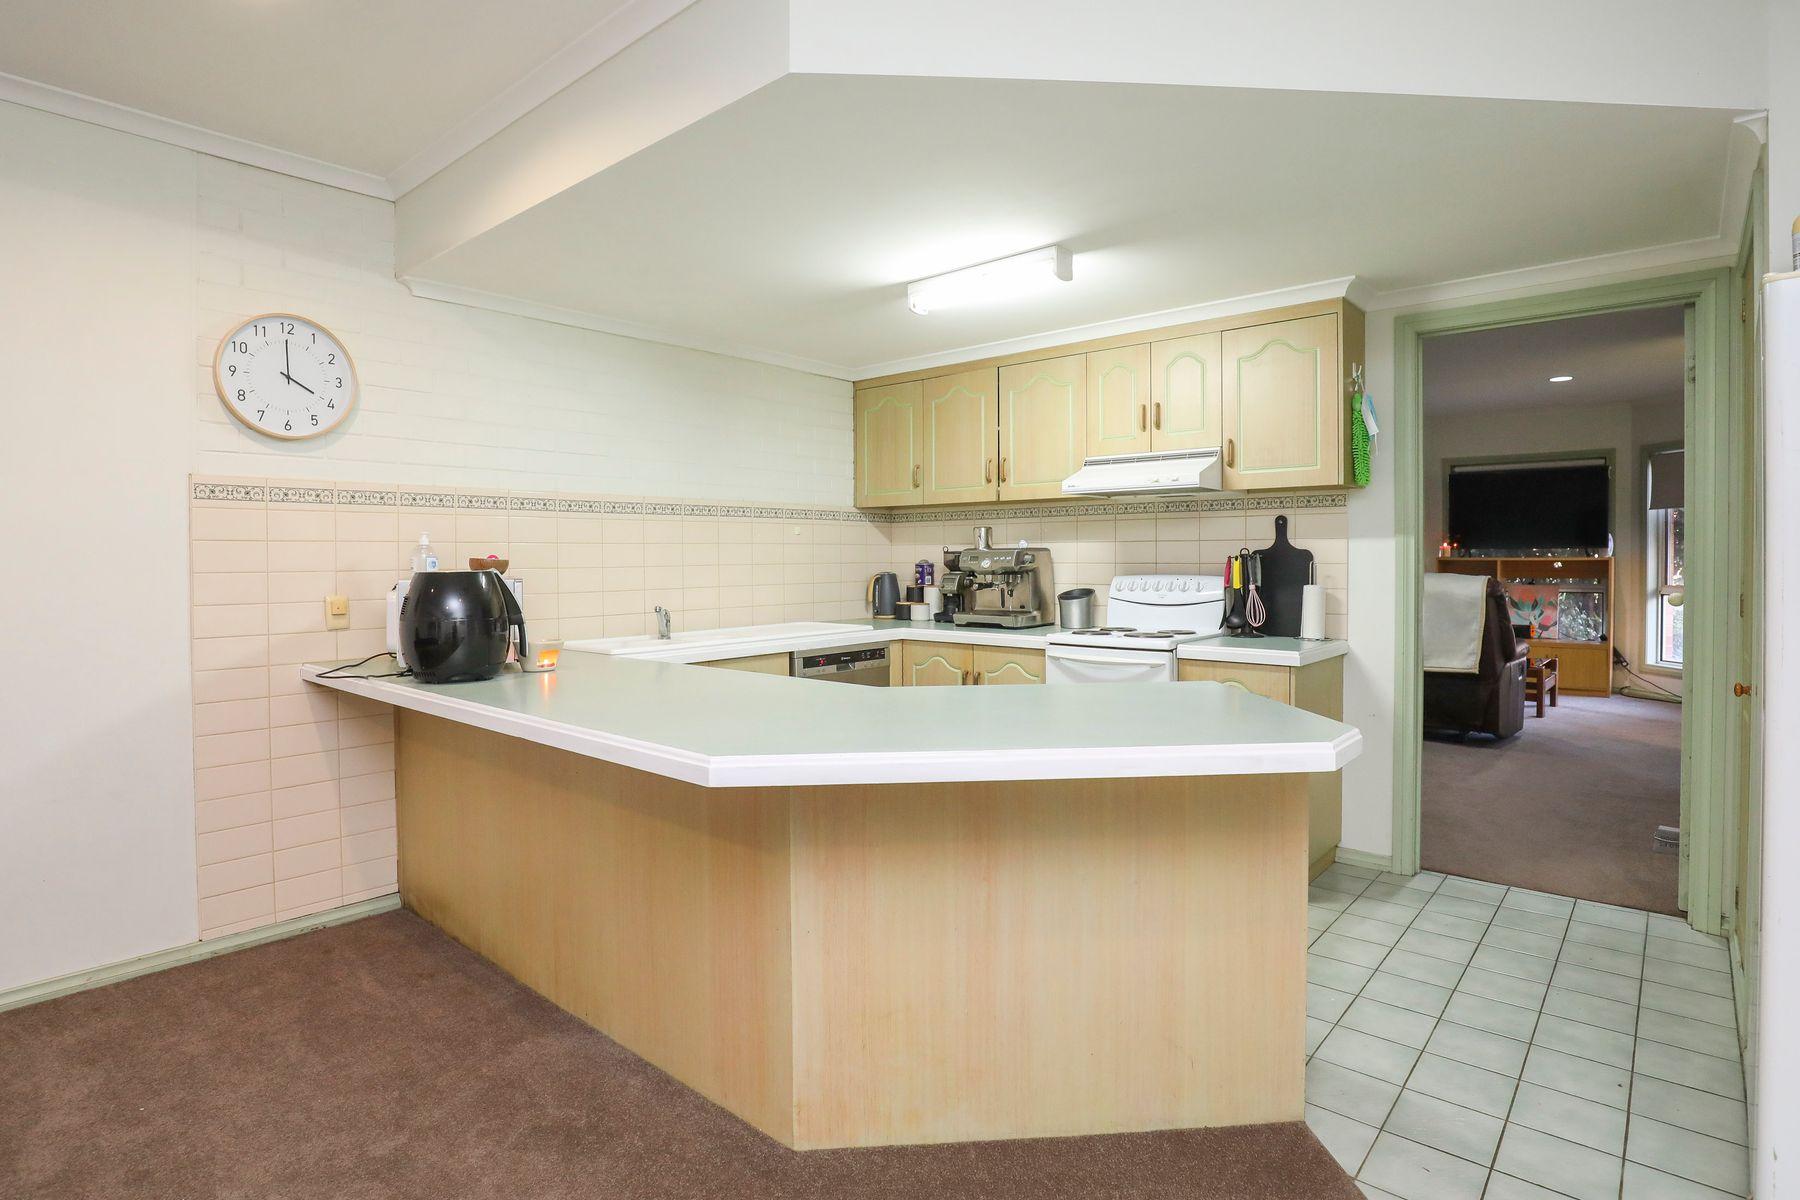 26 Marsden Drive, Mildura, VIC 3500